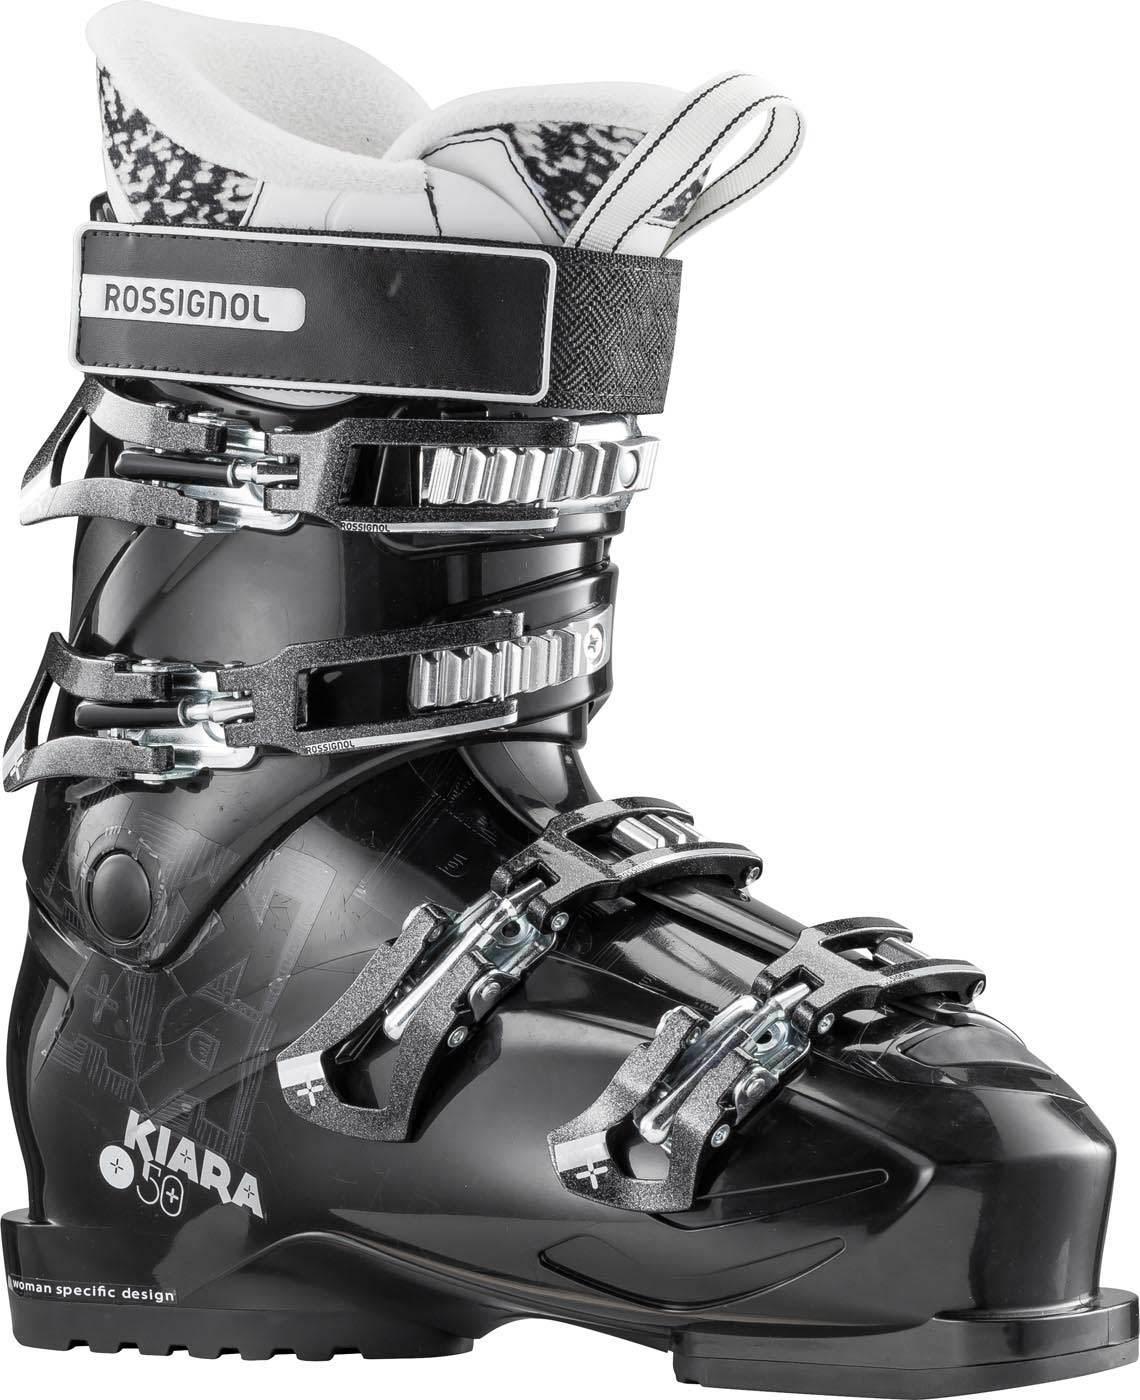 Chaussures De Ski Kiara Sensor 50 Noir Rossignol Femme